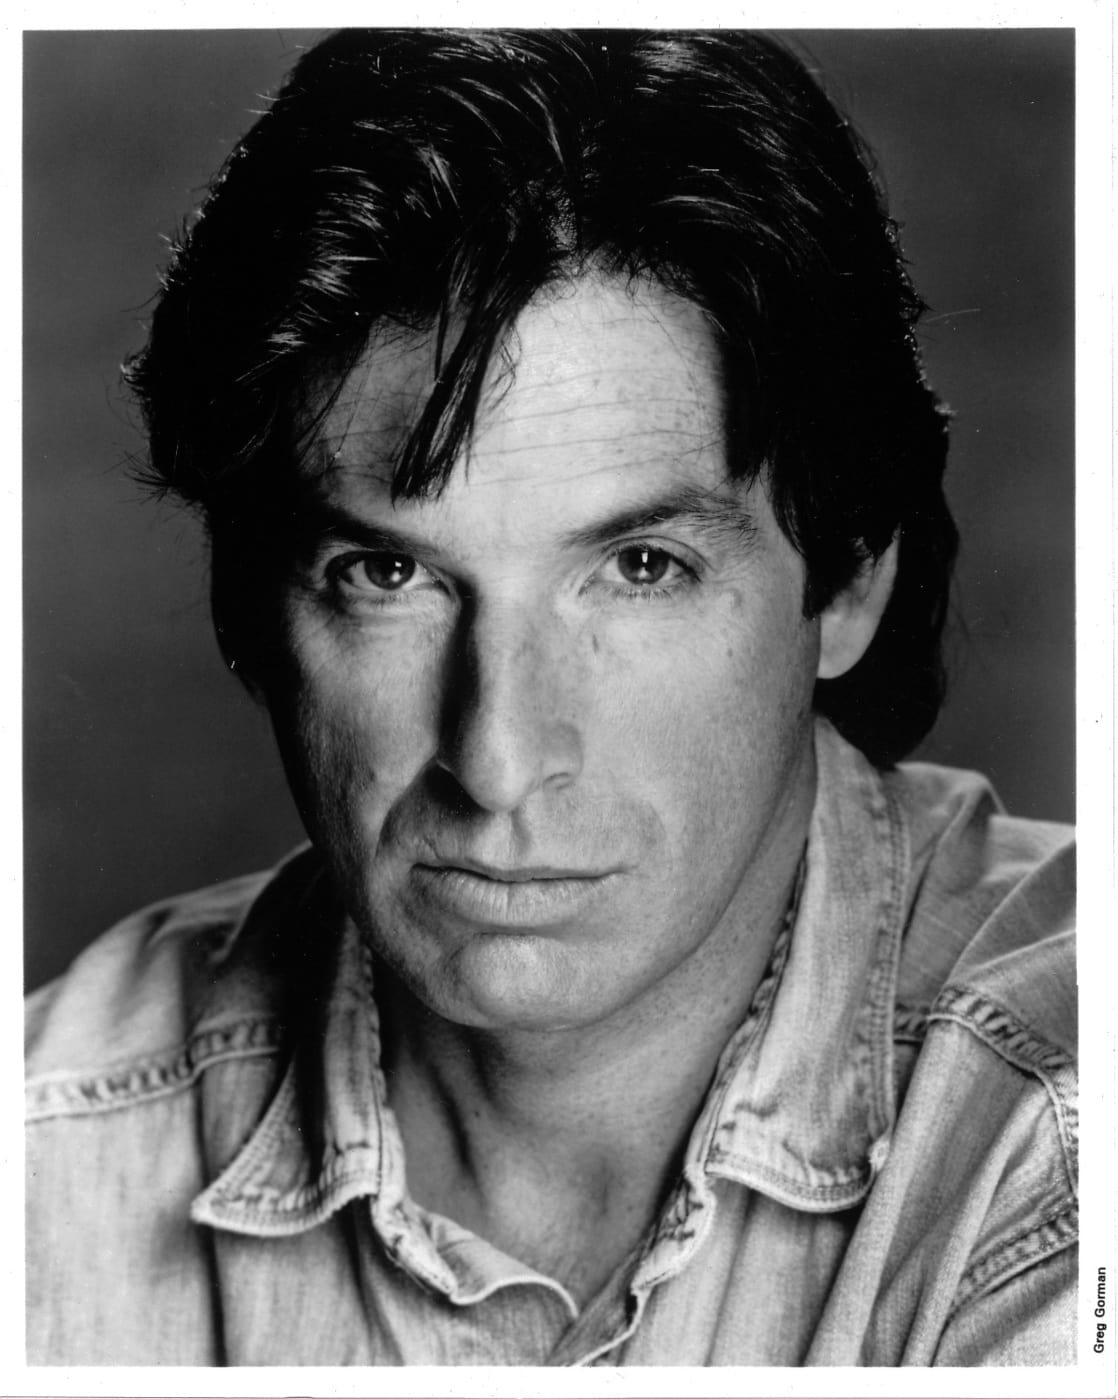 Robert Carradine Picture of Robert Carr...